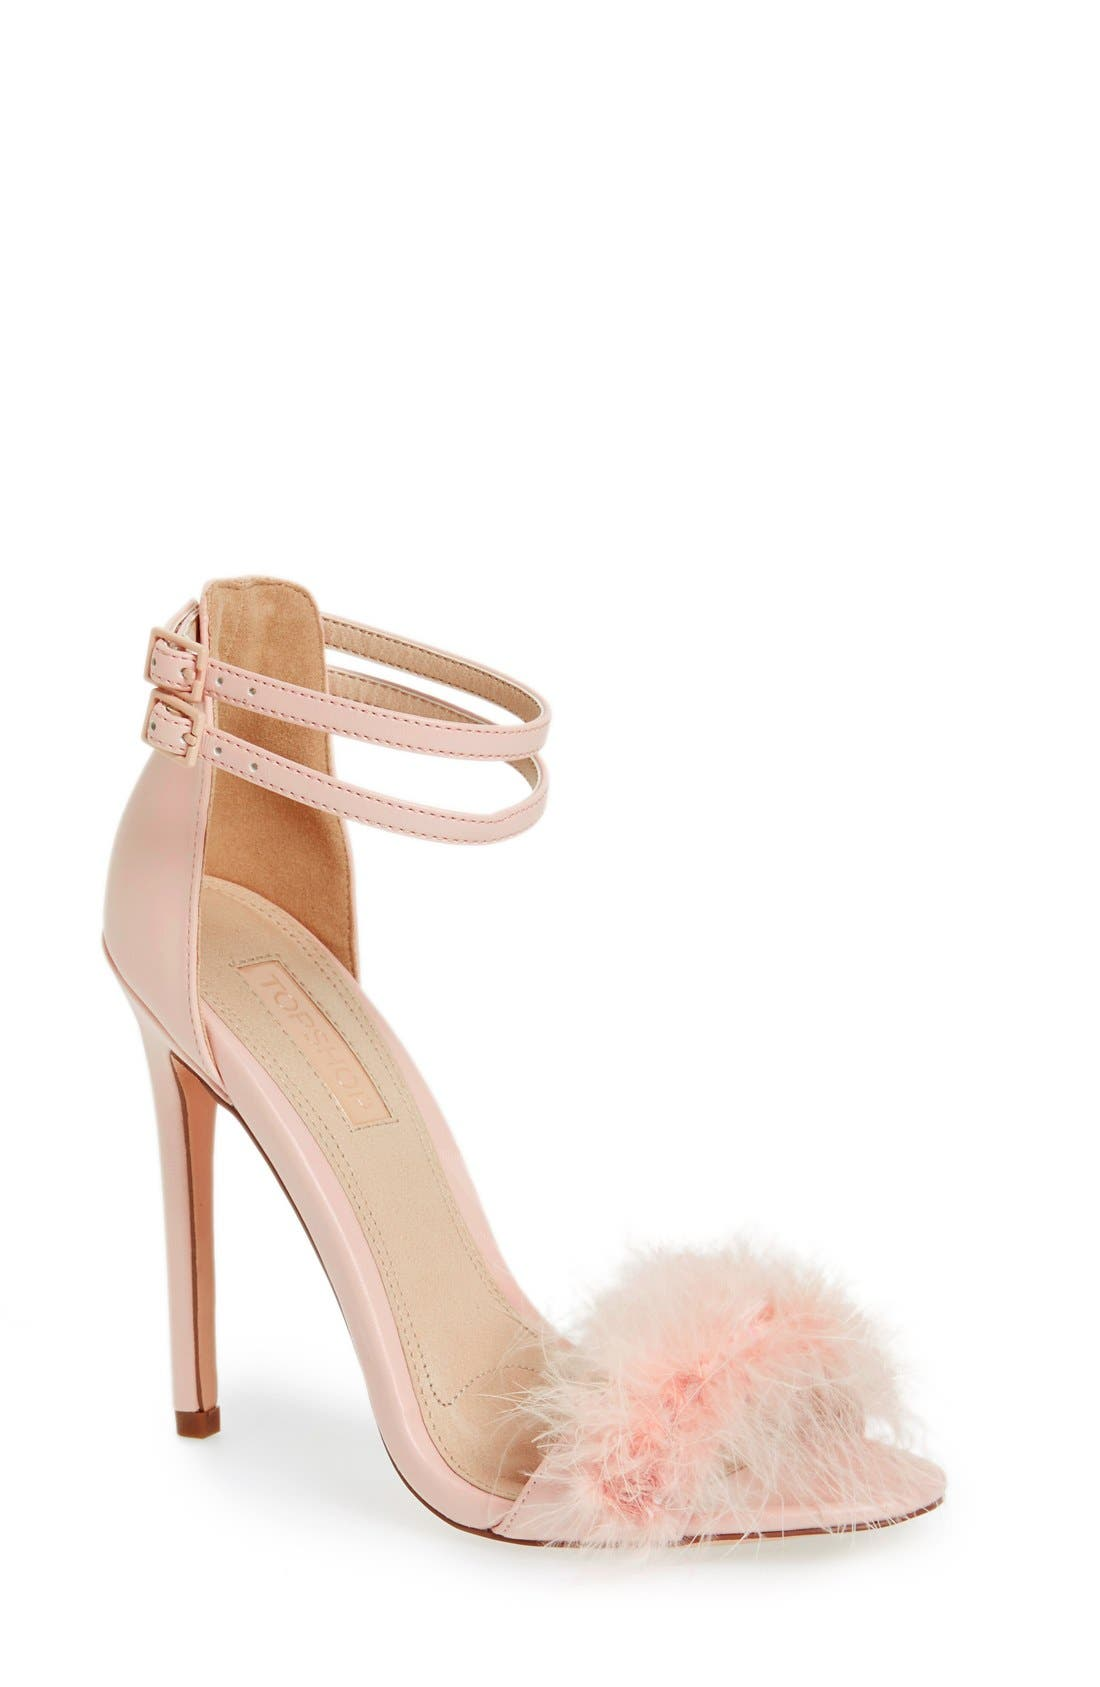 Main Image - Topshop 'Reese' Feather Sandal (Women)